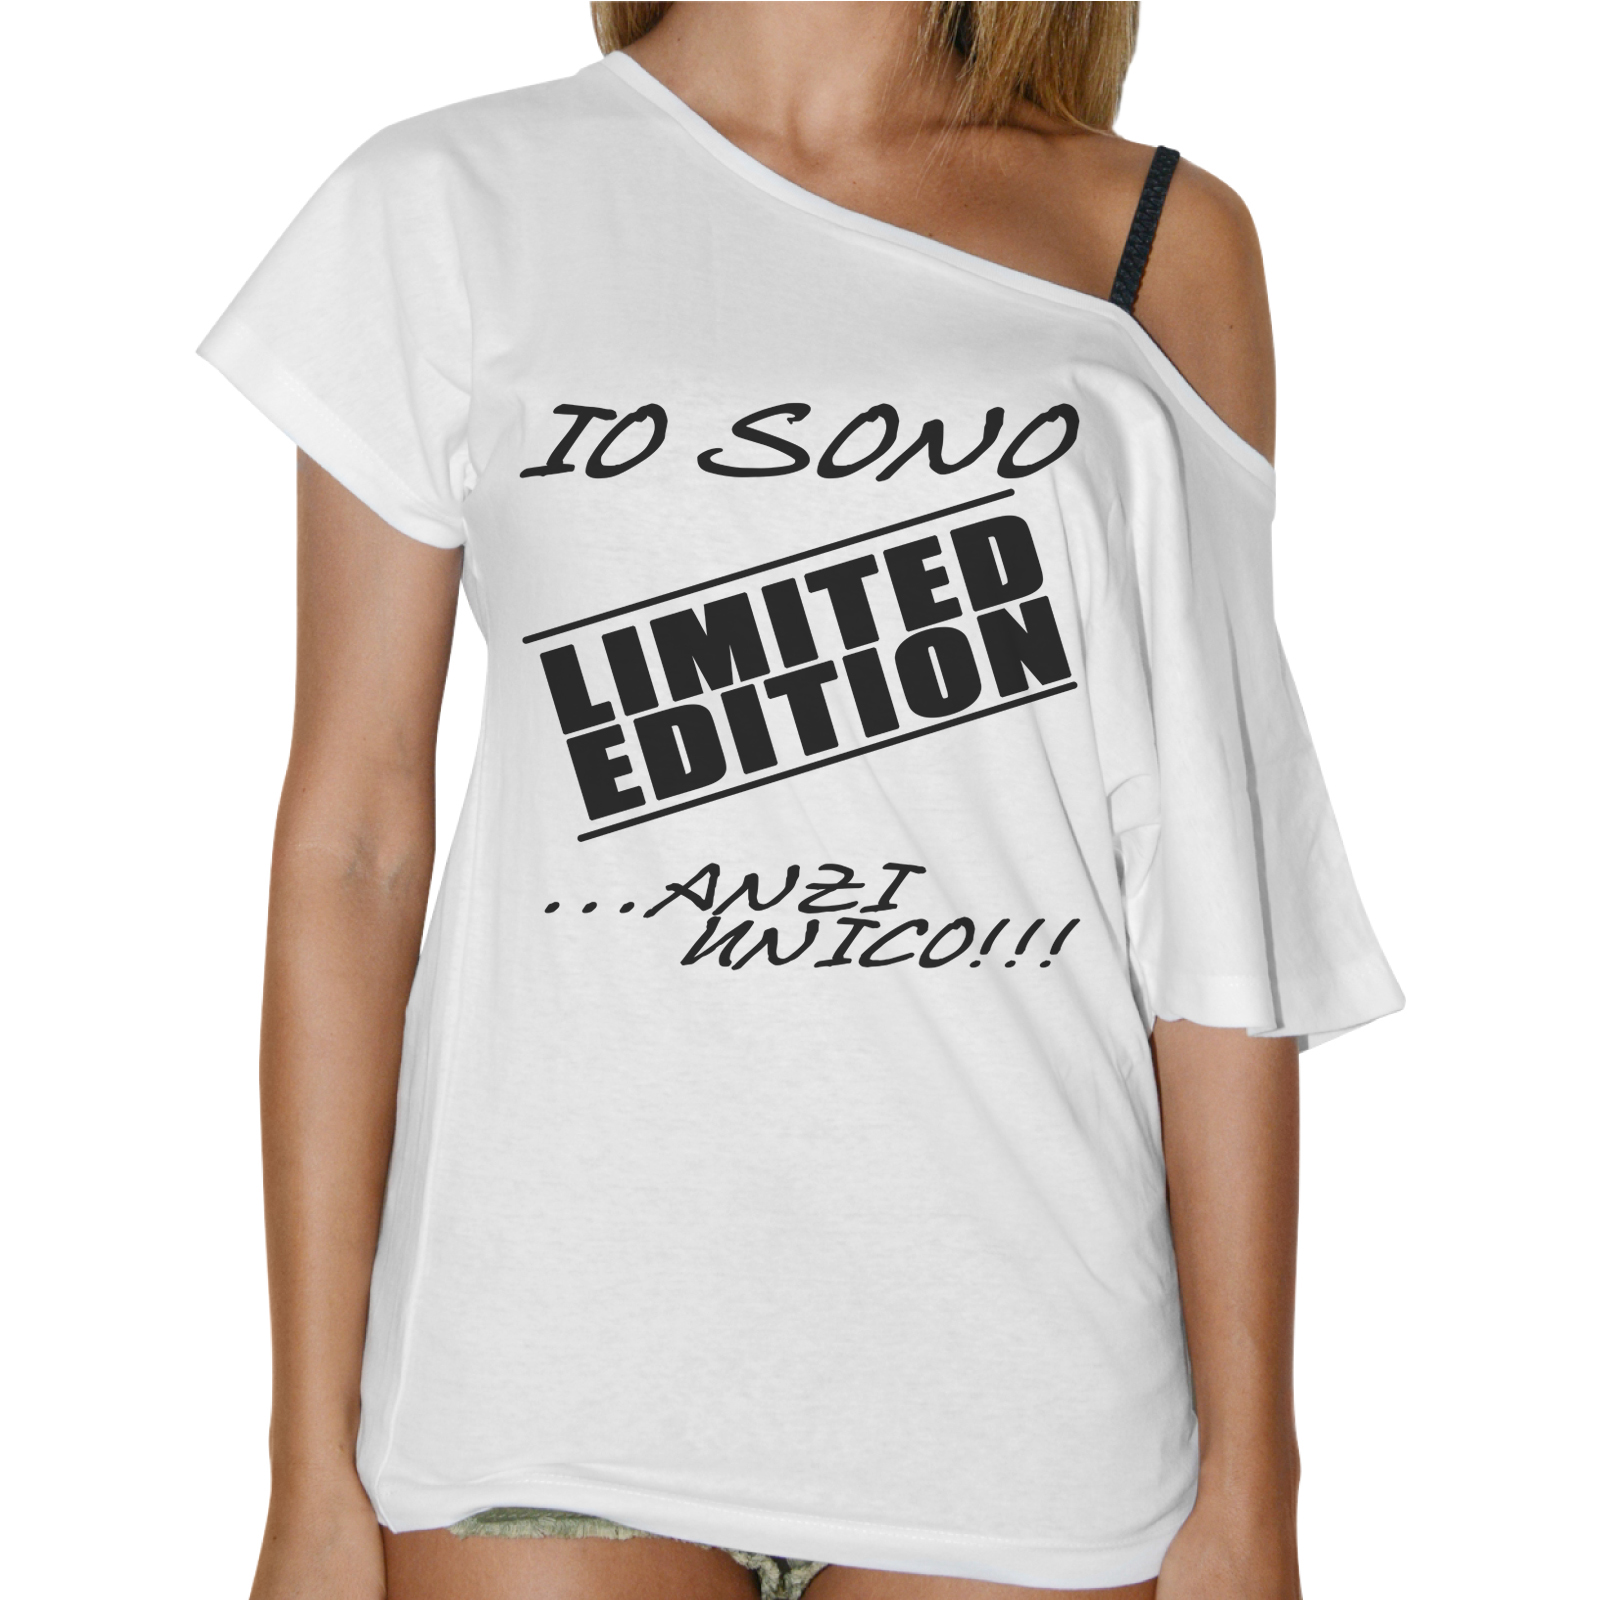 T-Shirt Donna Collo Barca LIMITED EDITION